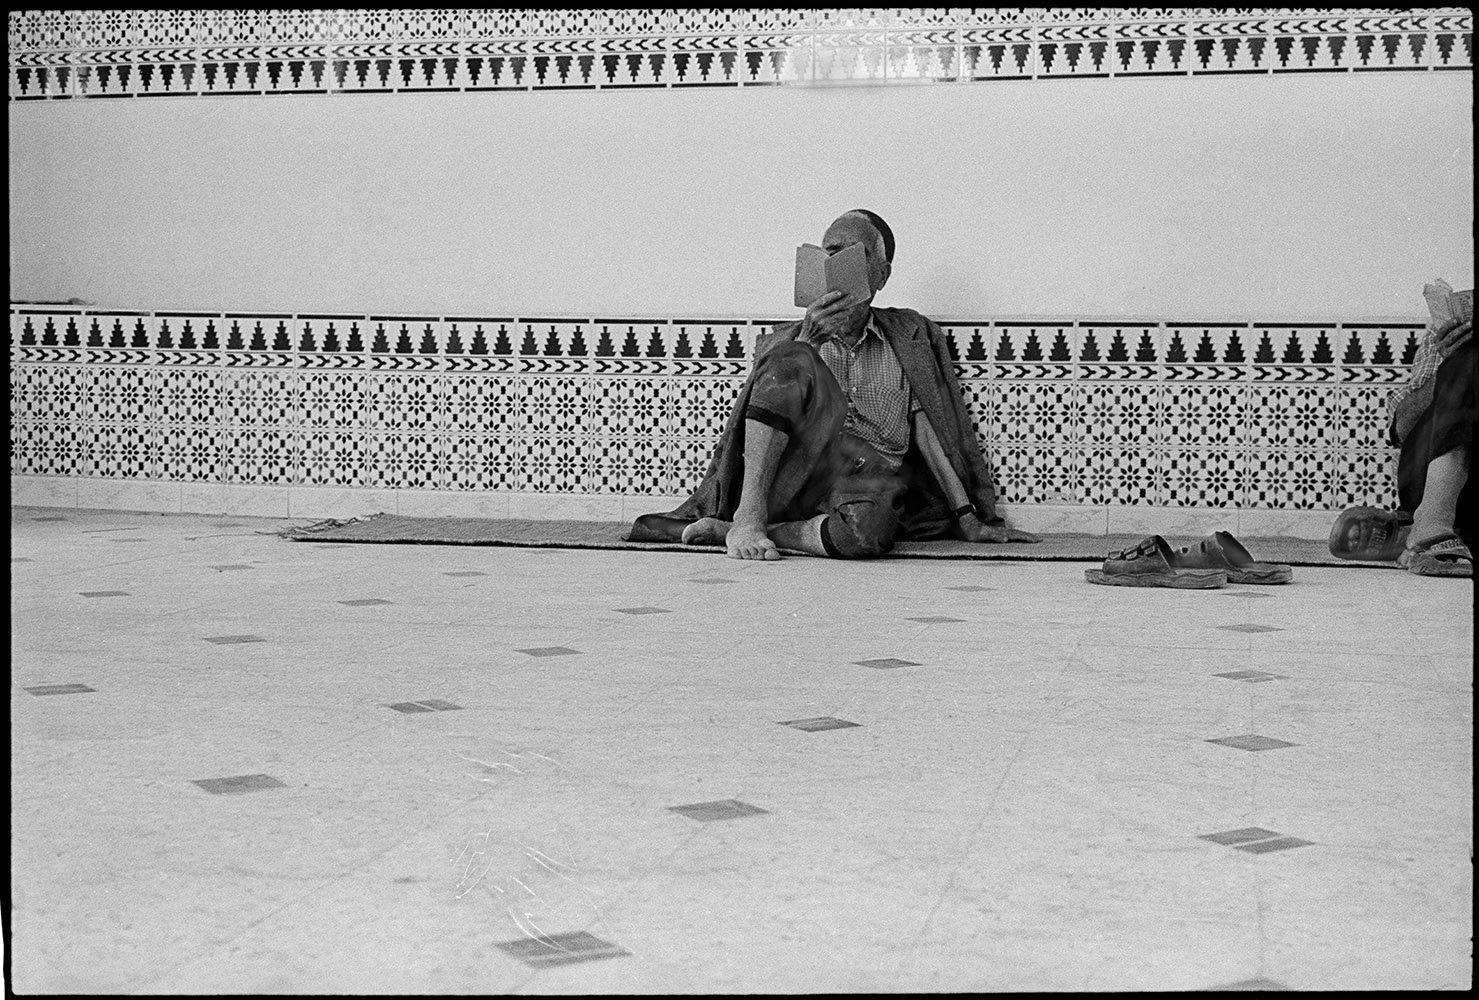 Prières au sol, Tisha B' Av. Djerba, 2002.